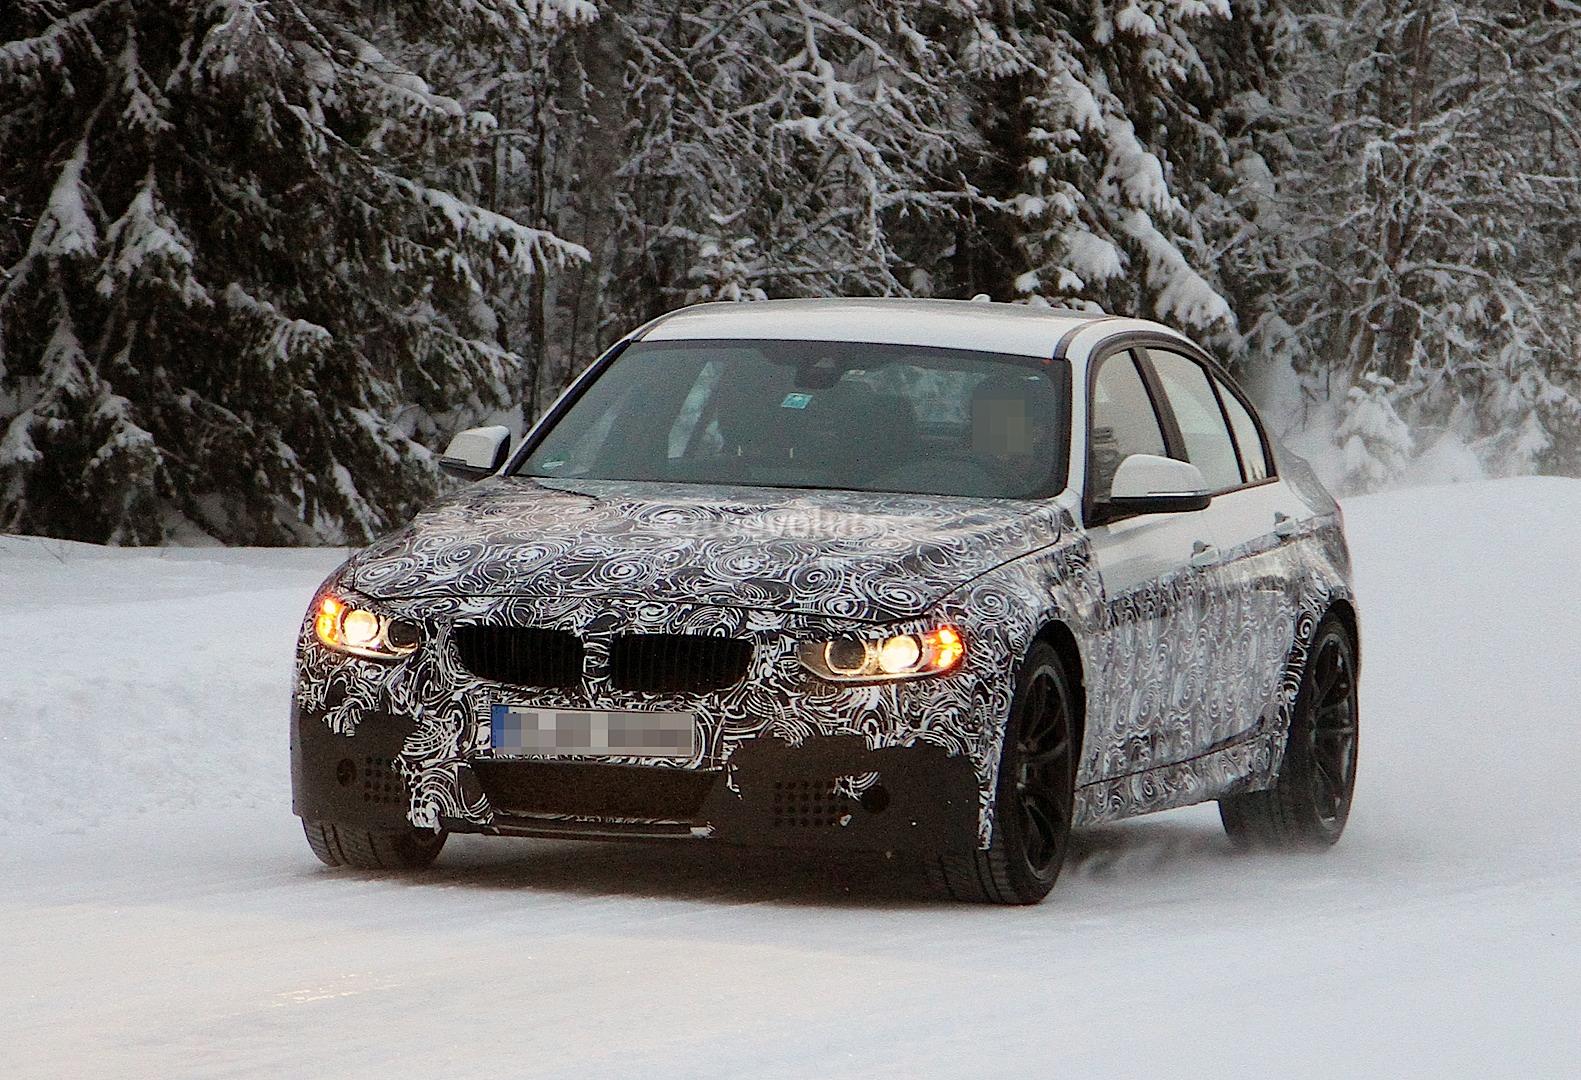 F80 BMW M3 spied